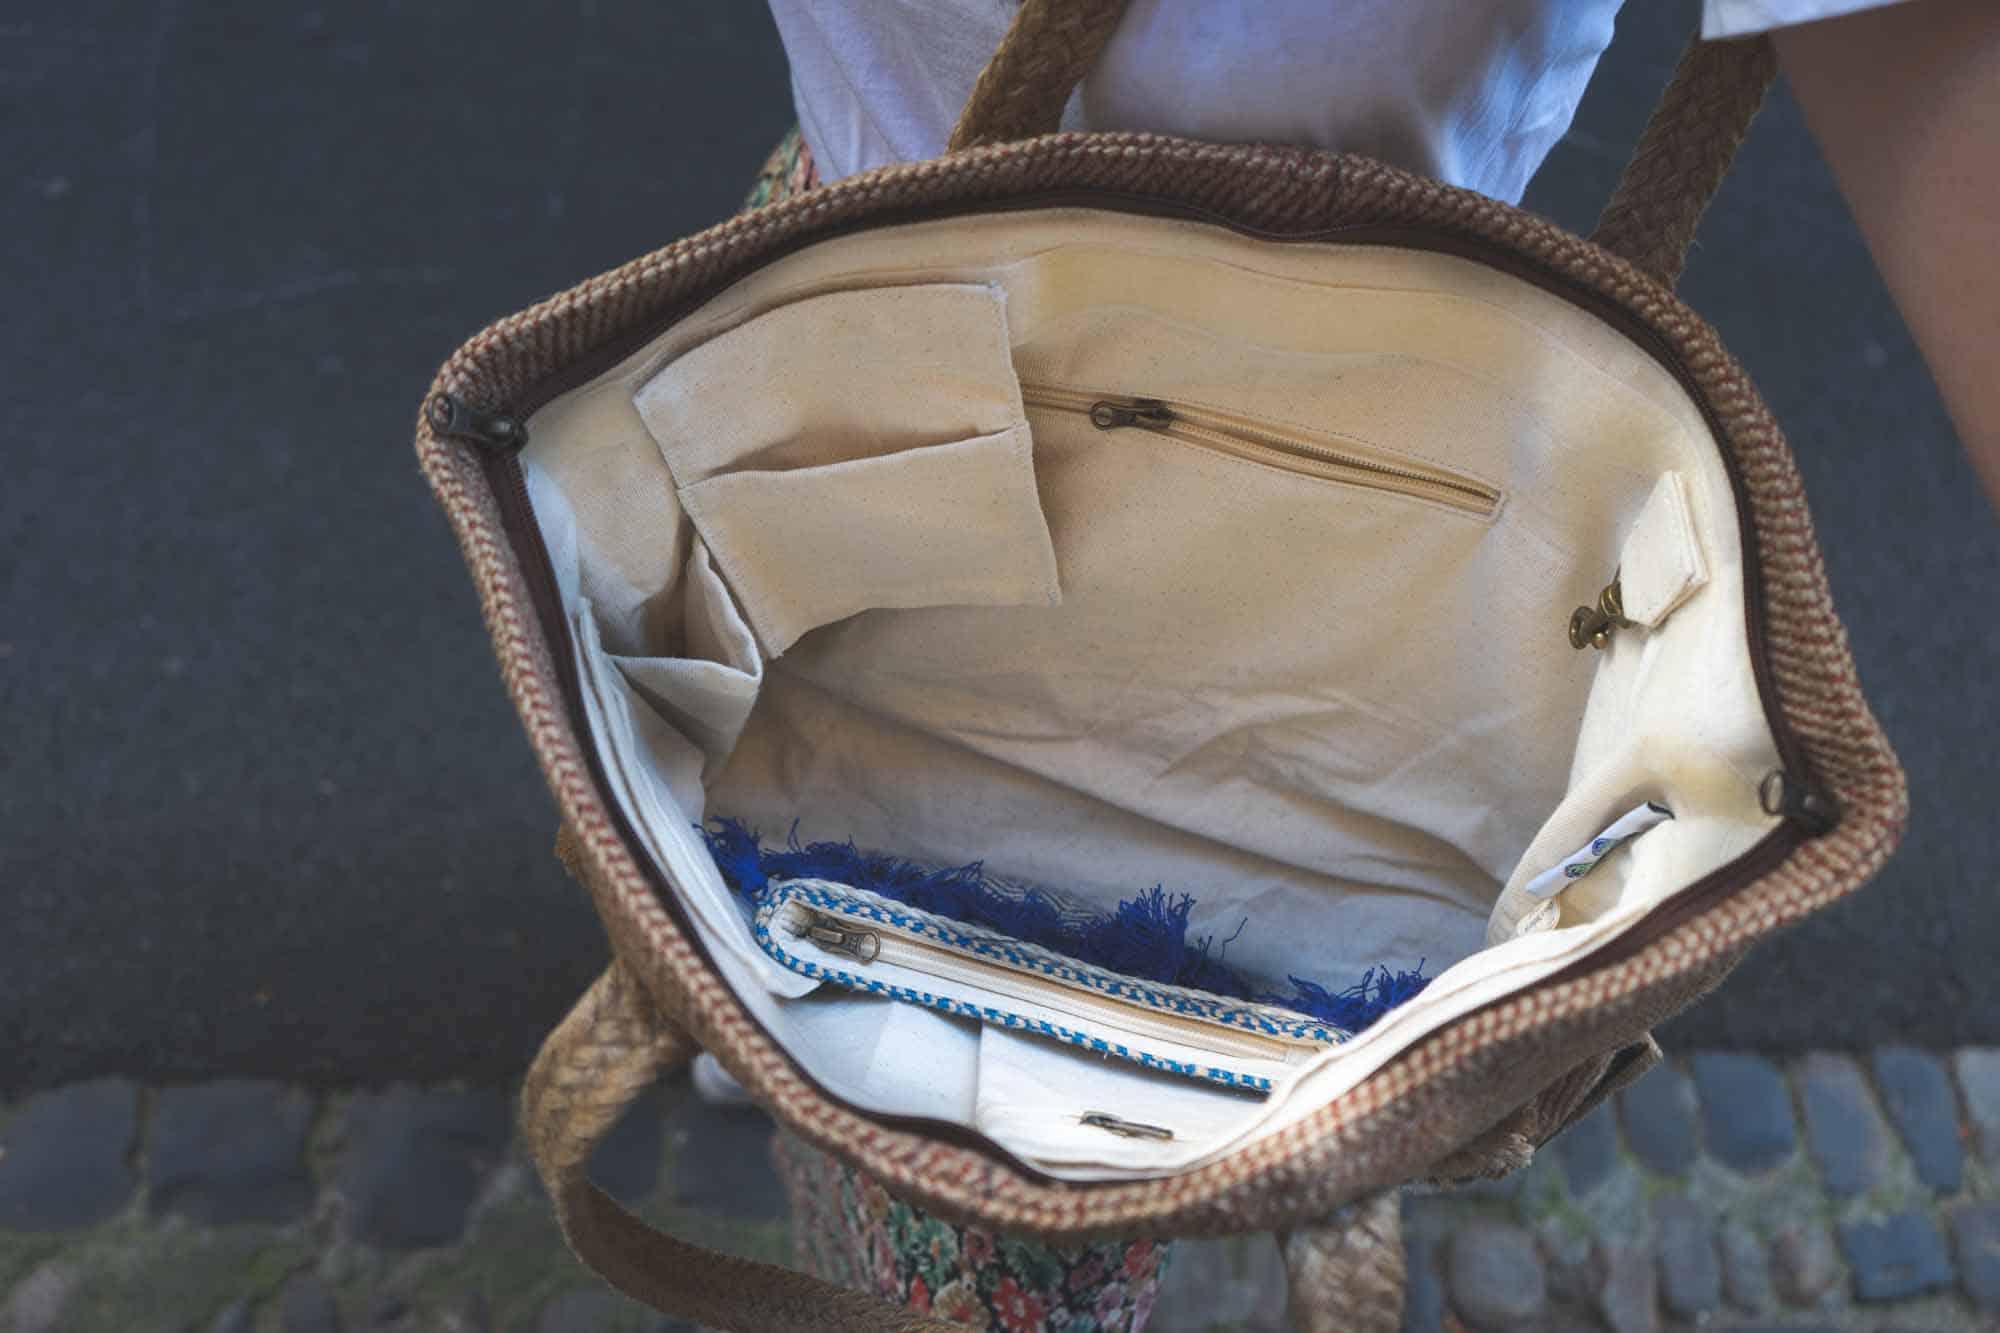 sac à main intérieur